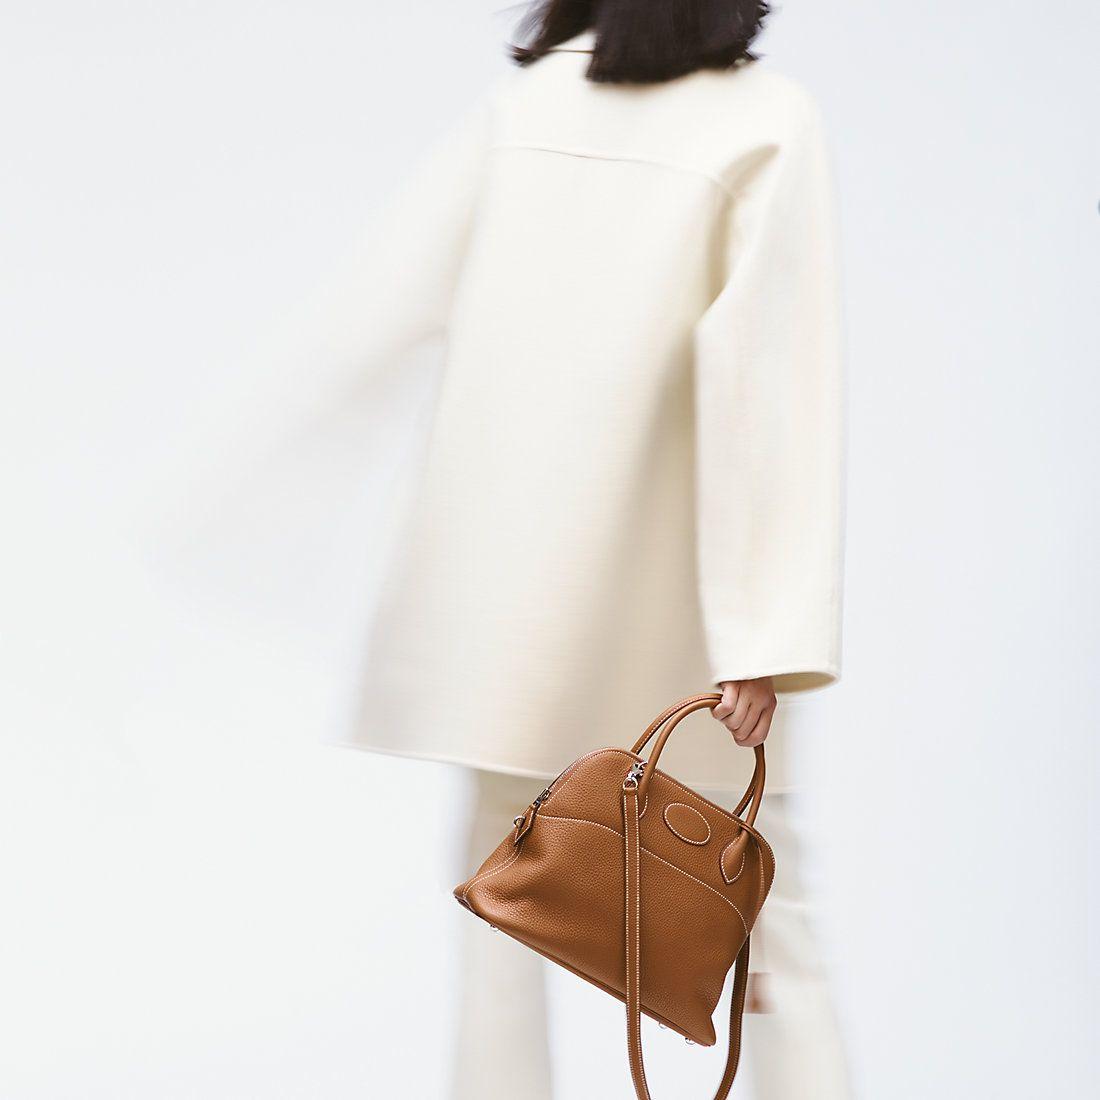 Hermès Makes A Big Statement Unveiling Mushroom-Based 'Leather' Bags